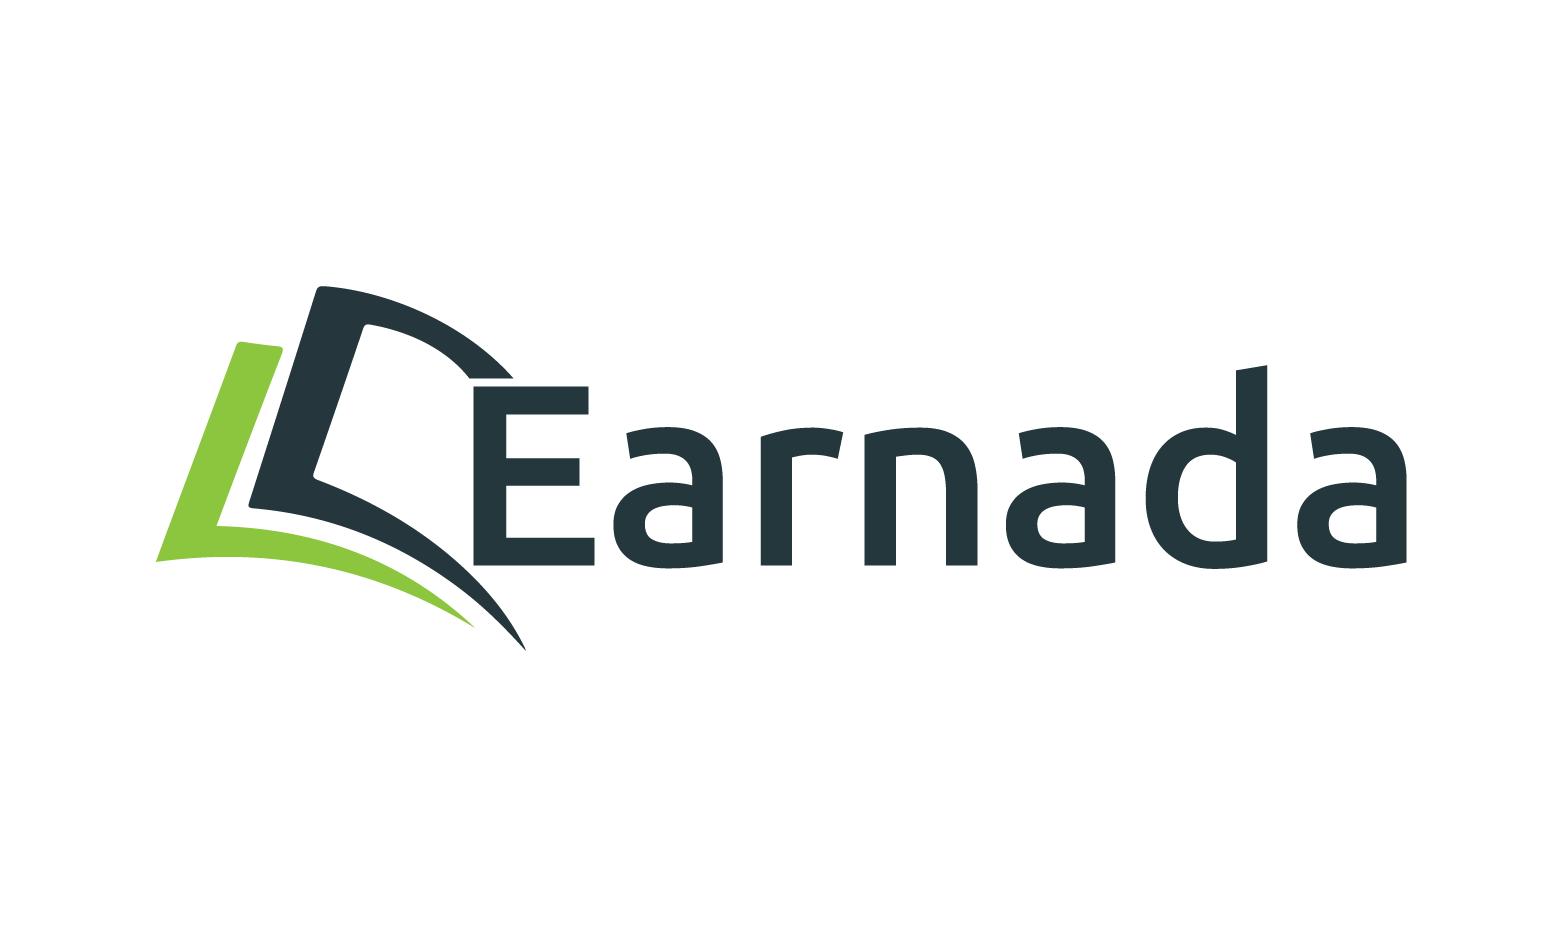 Earnada.com